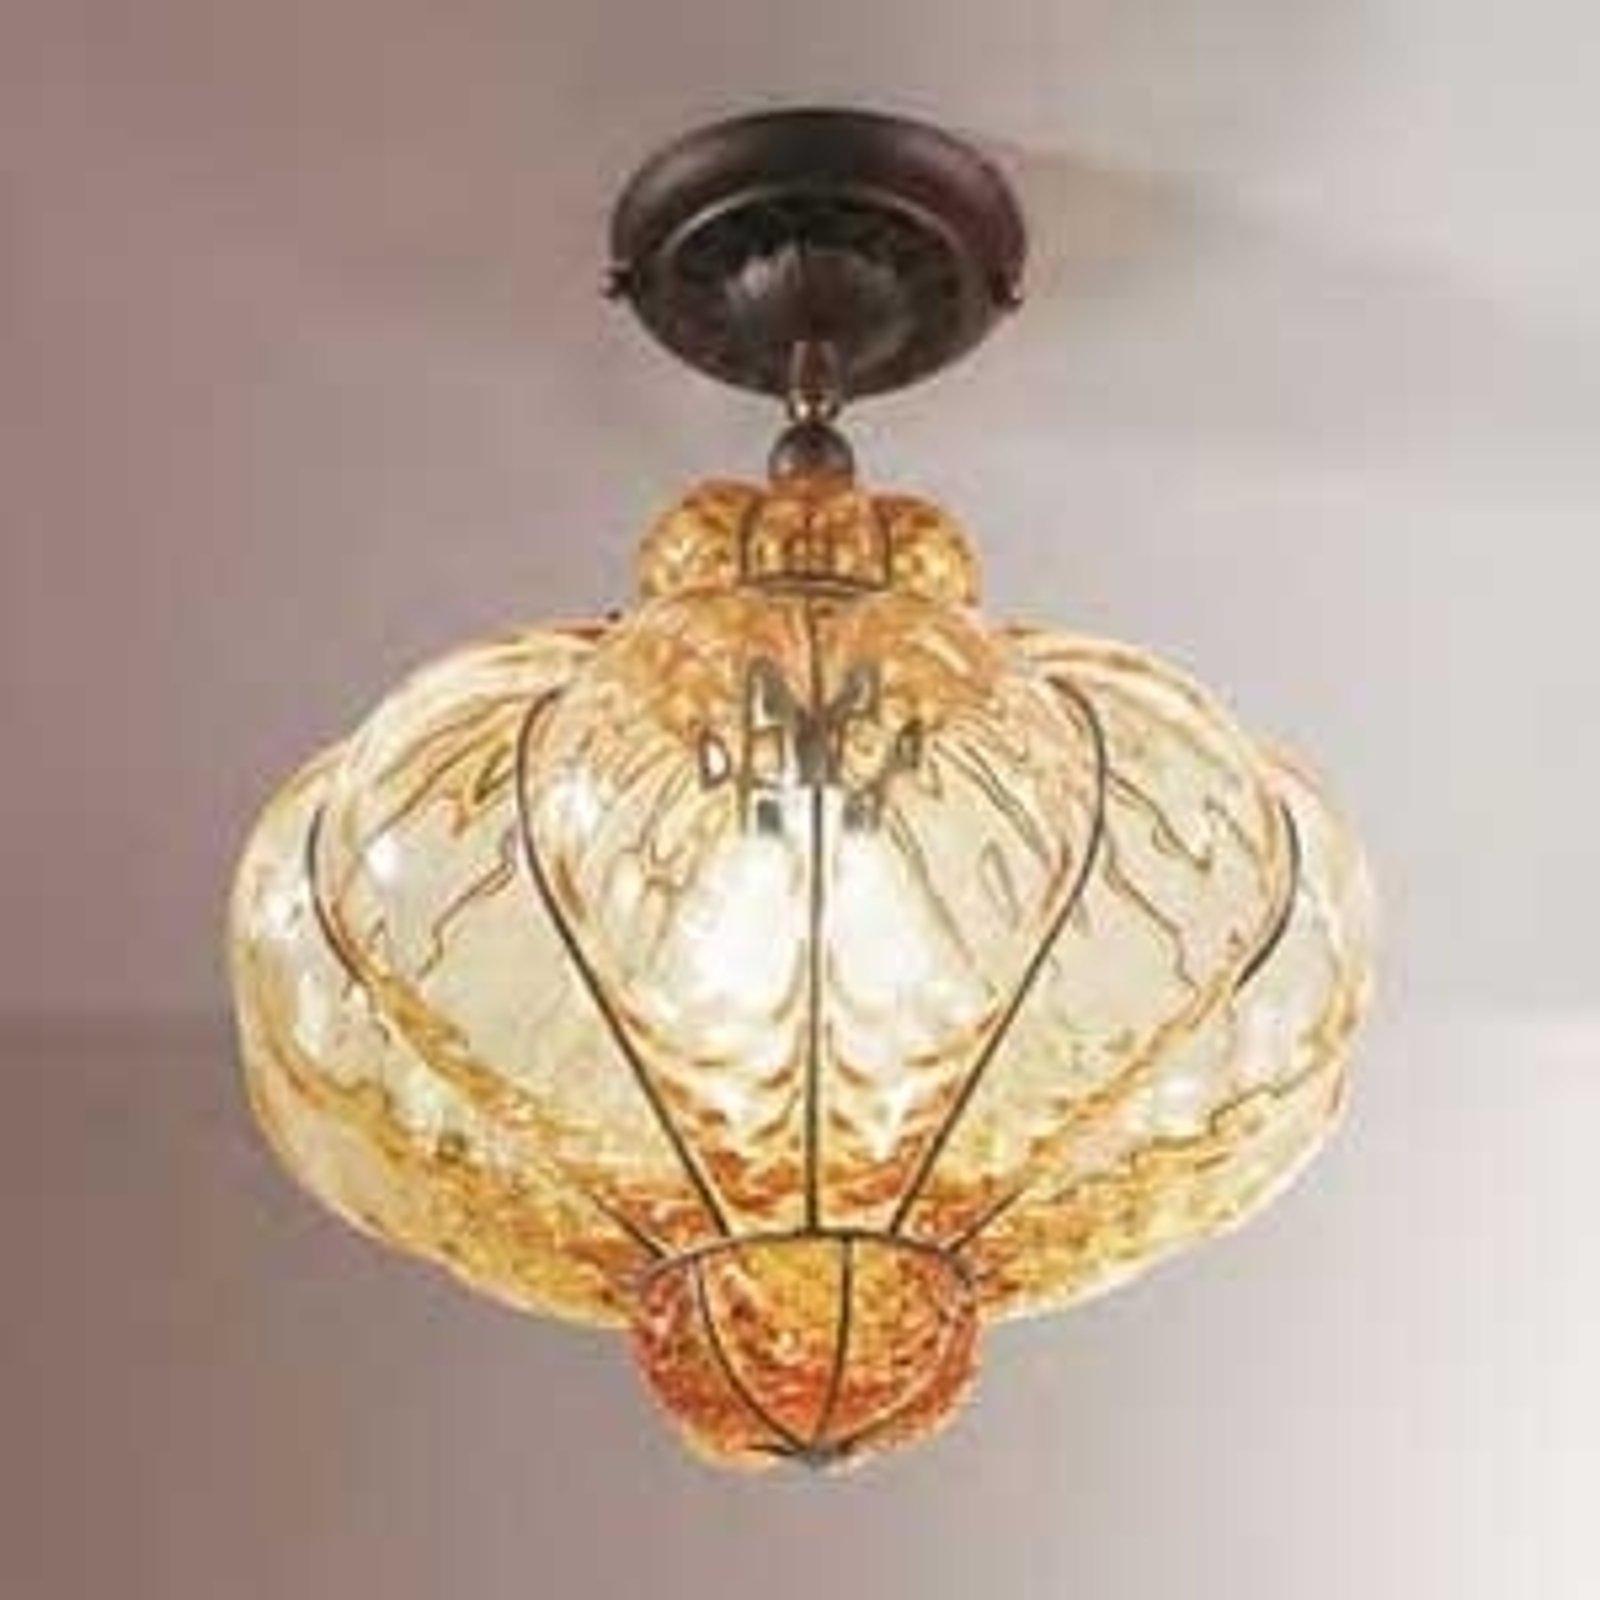 Muranoglass-taklampe SULTANO, 42 cm